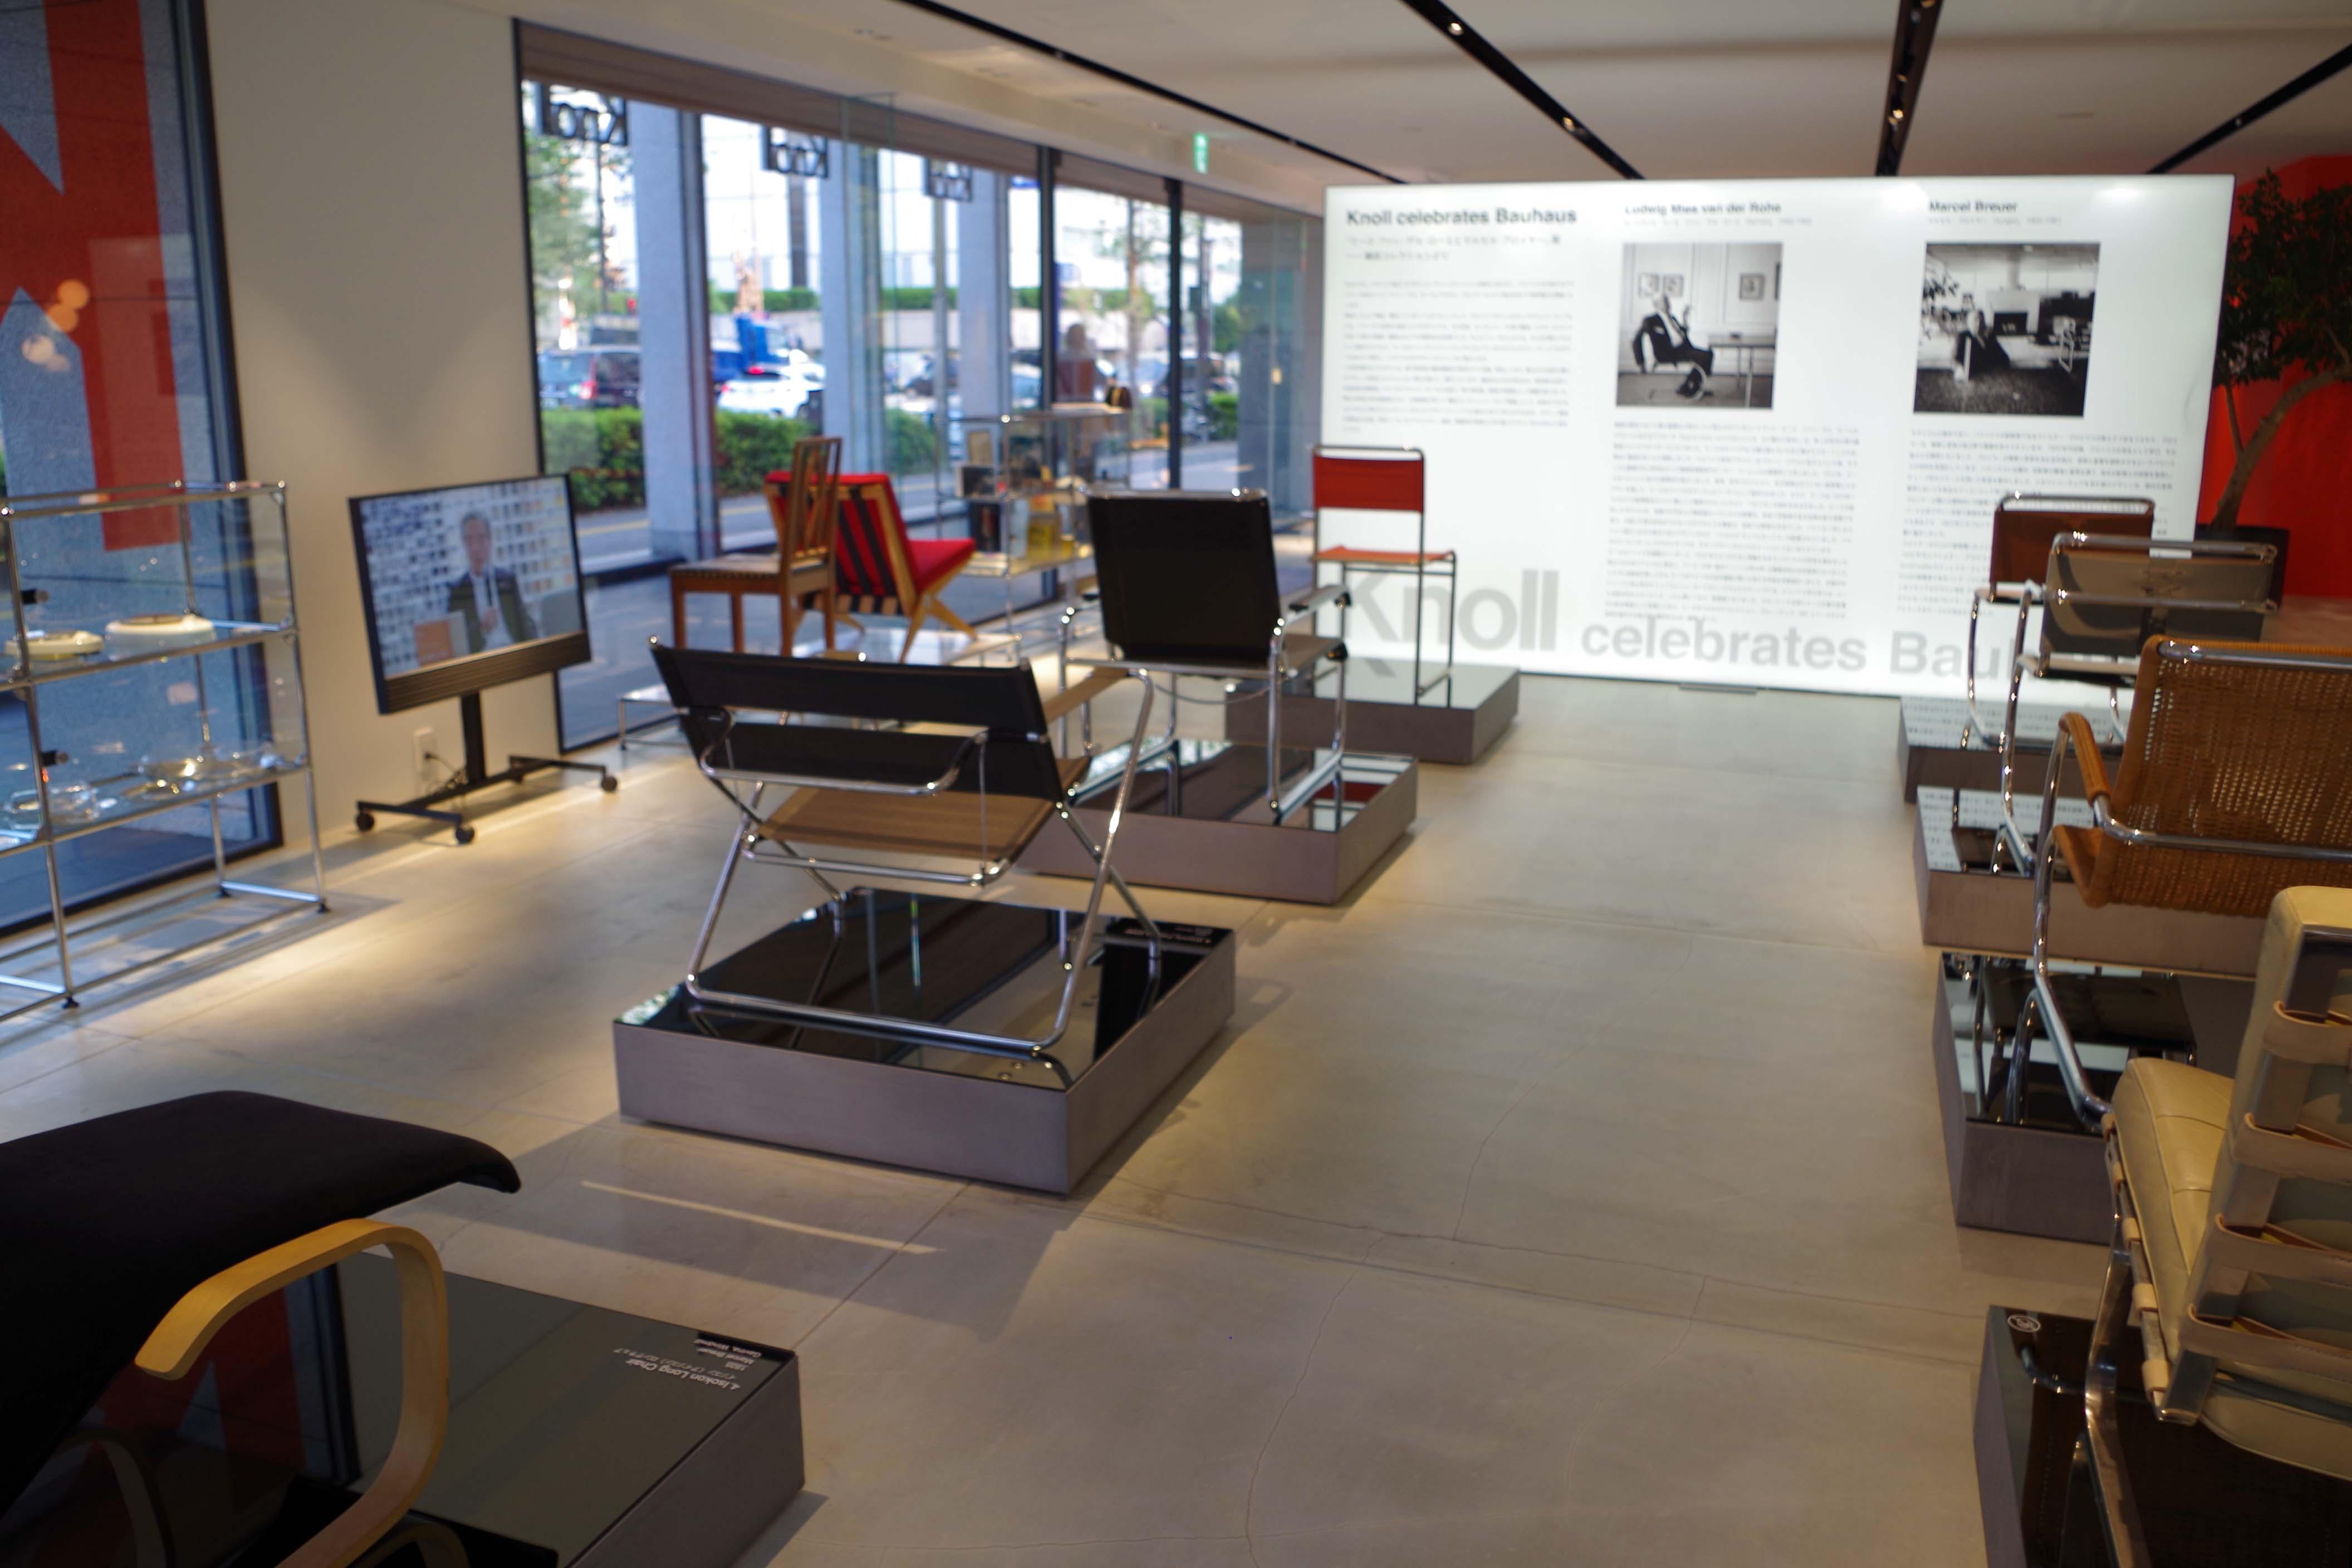 Knoll celebrates Bauhaus光景